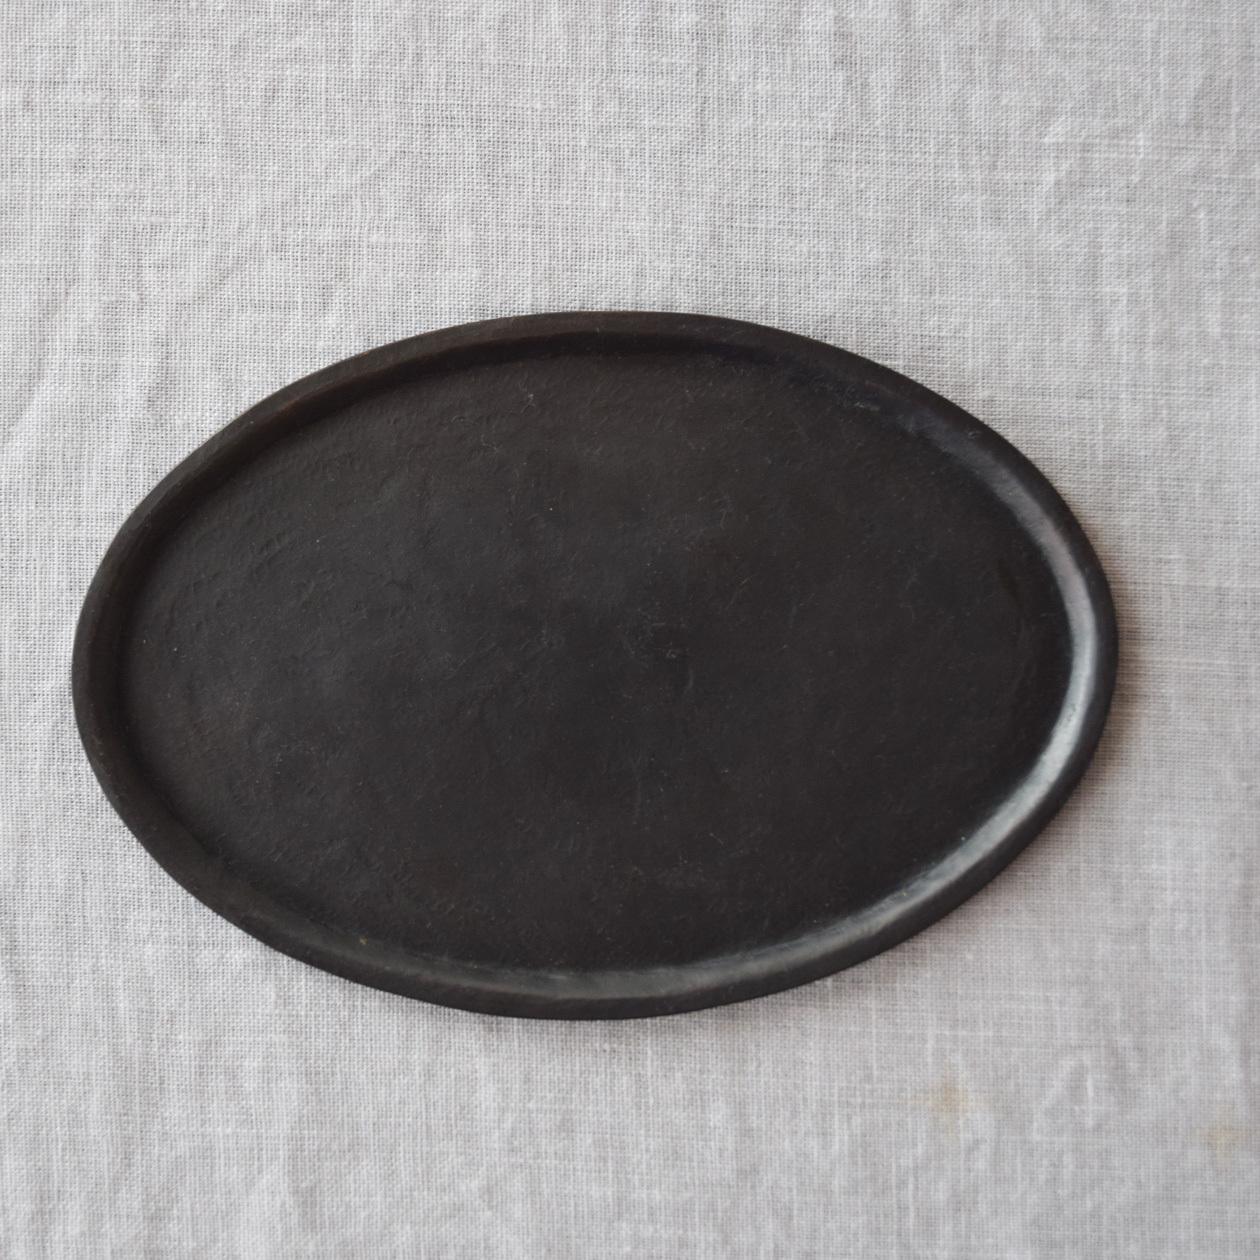 三輪周太郎 Shutaro Miwa  銅製楕円リム皿  b